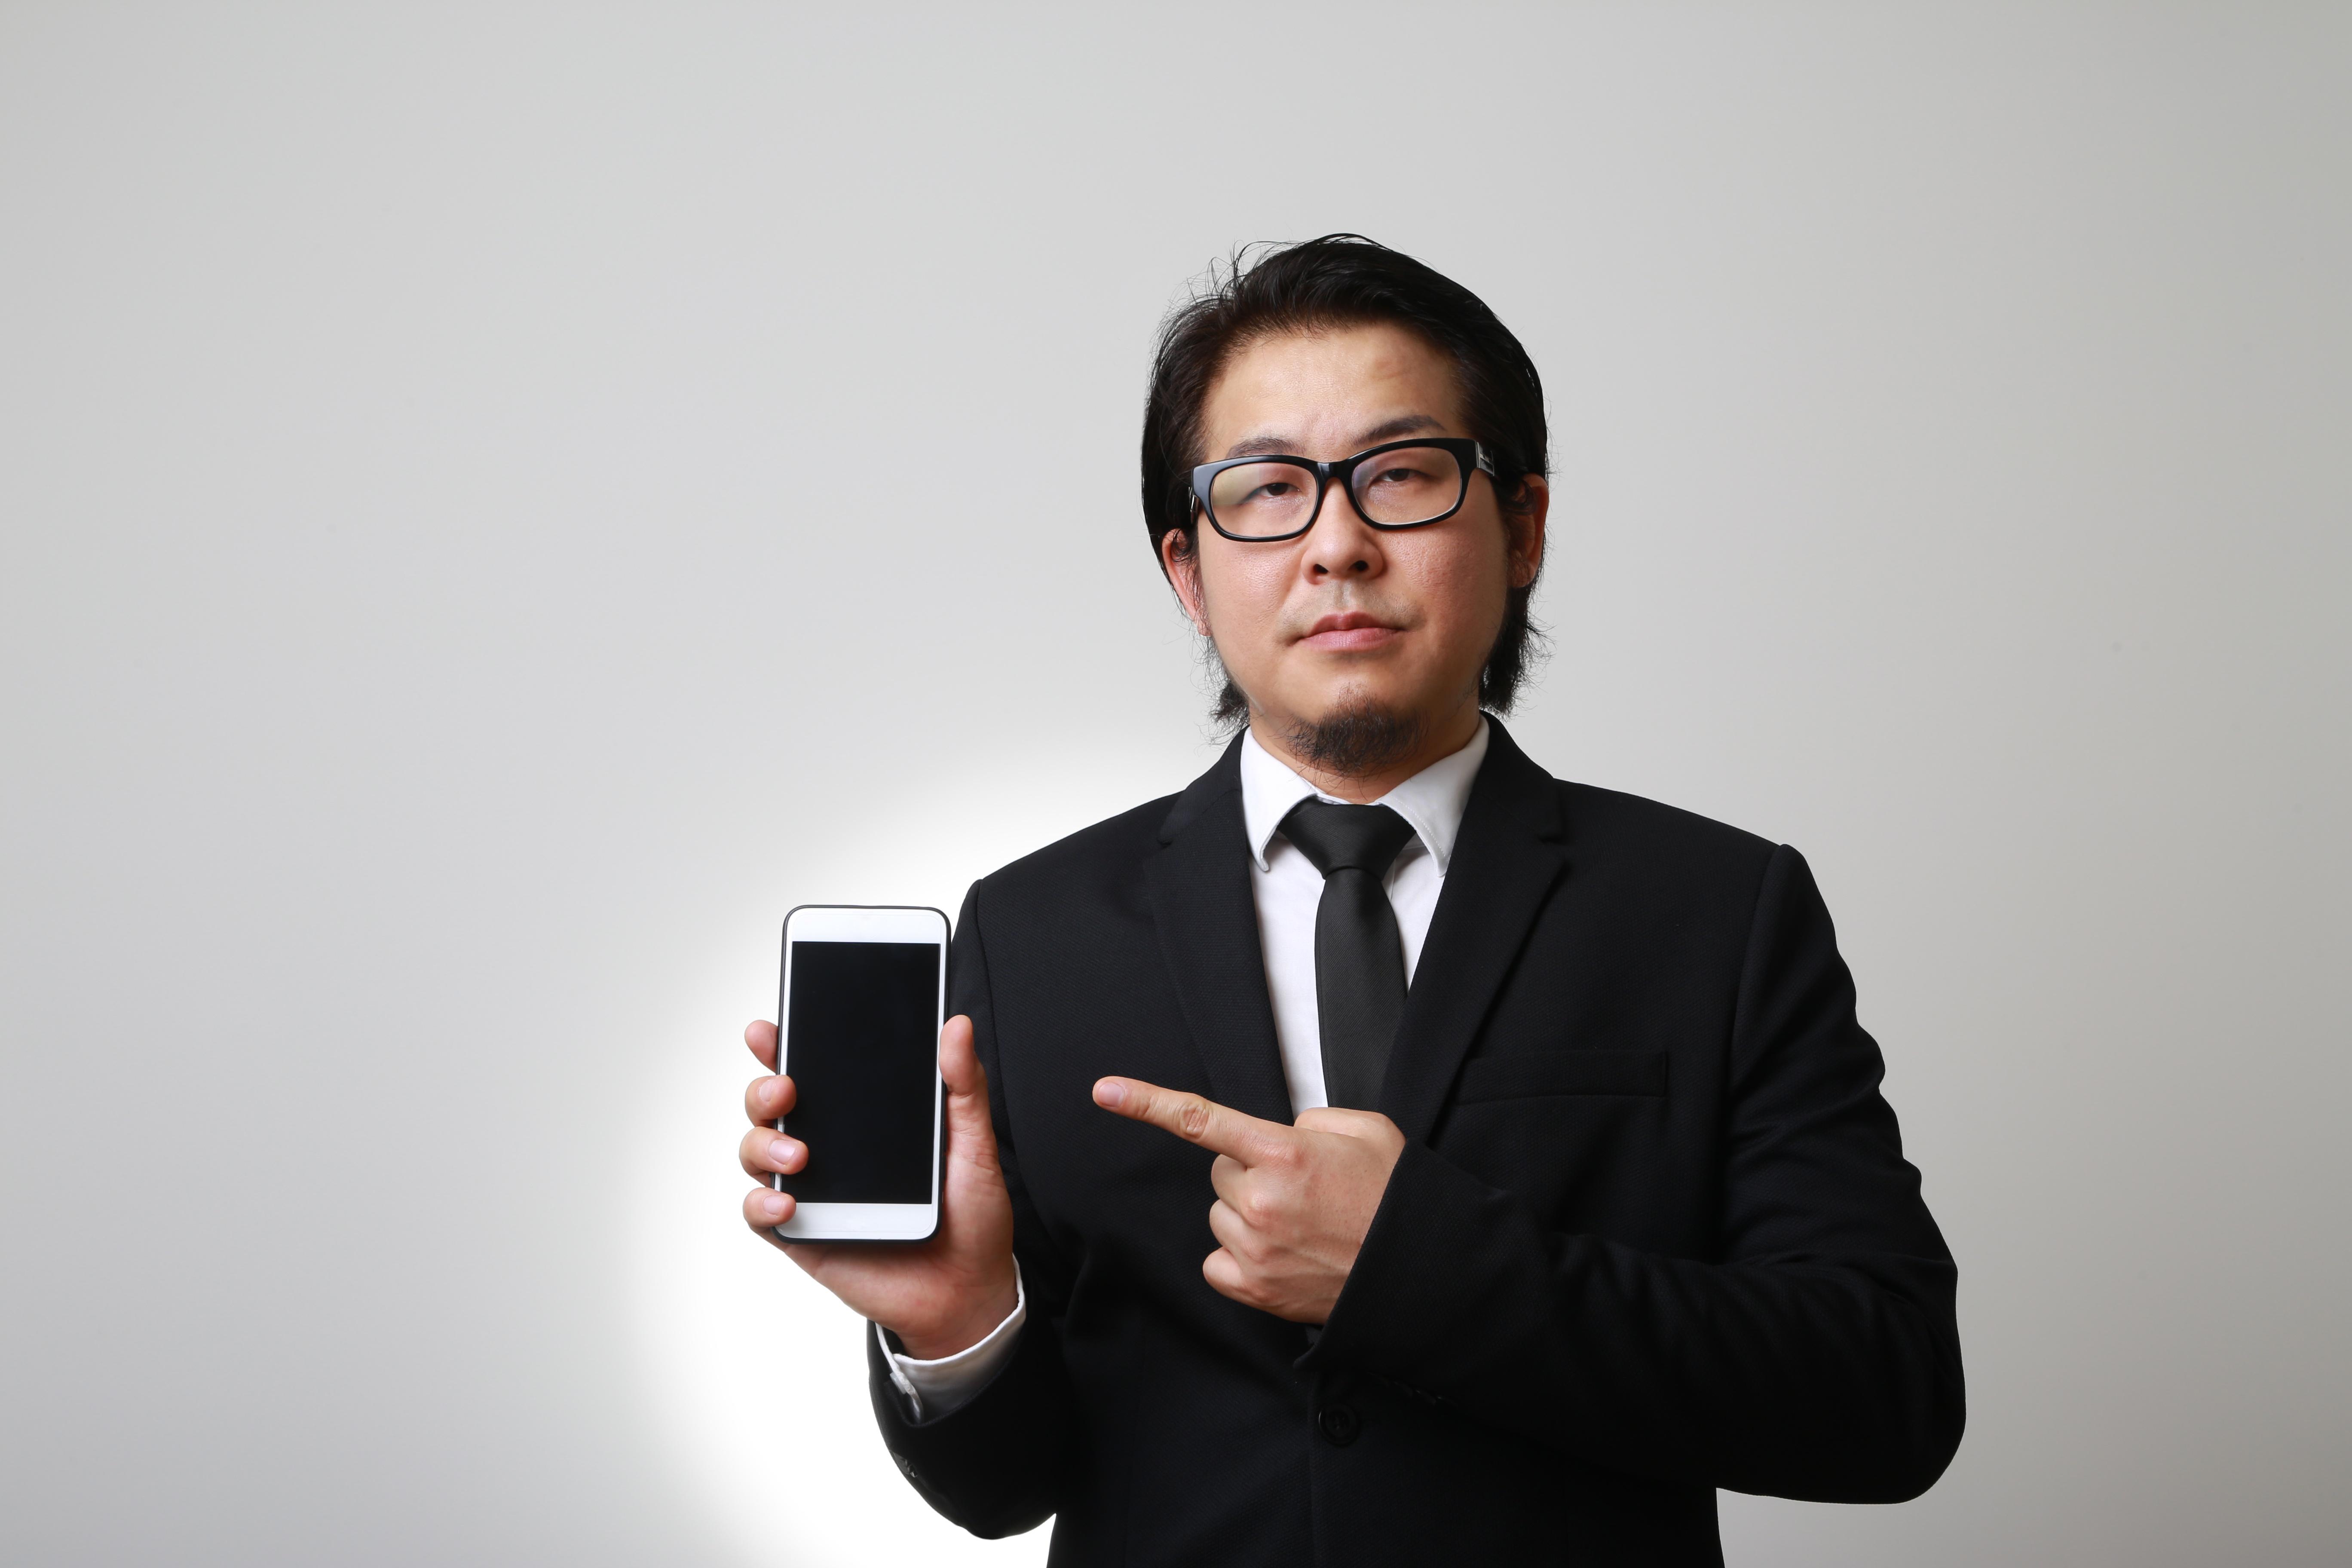 Phone_Stock.jpg